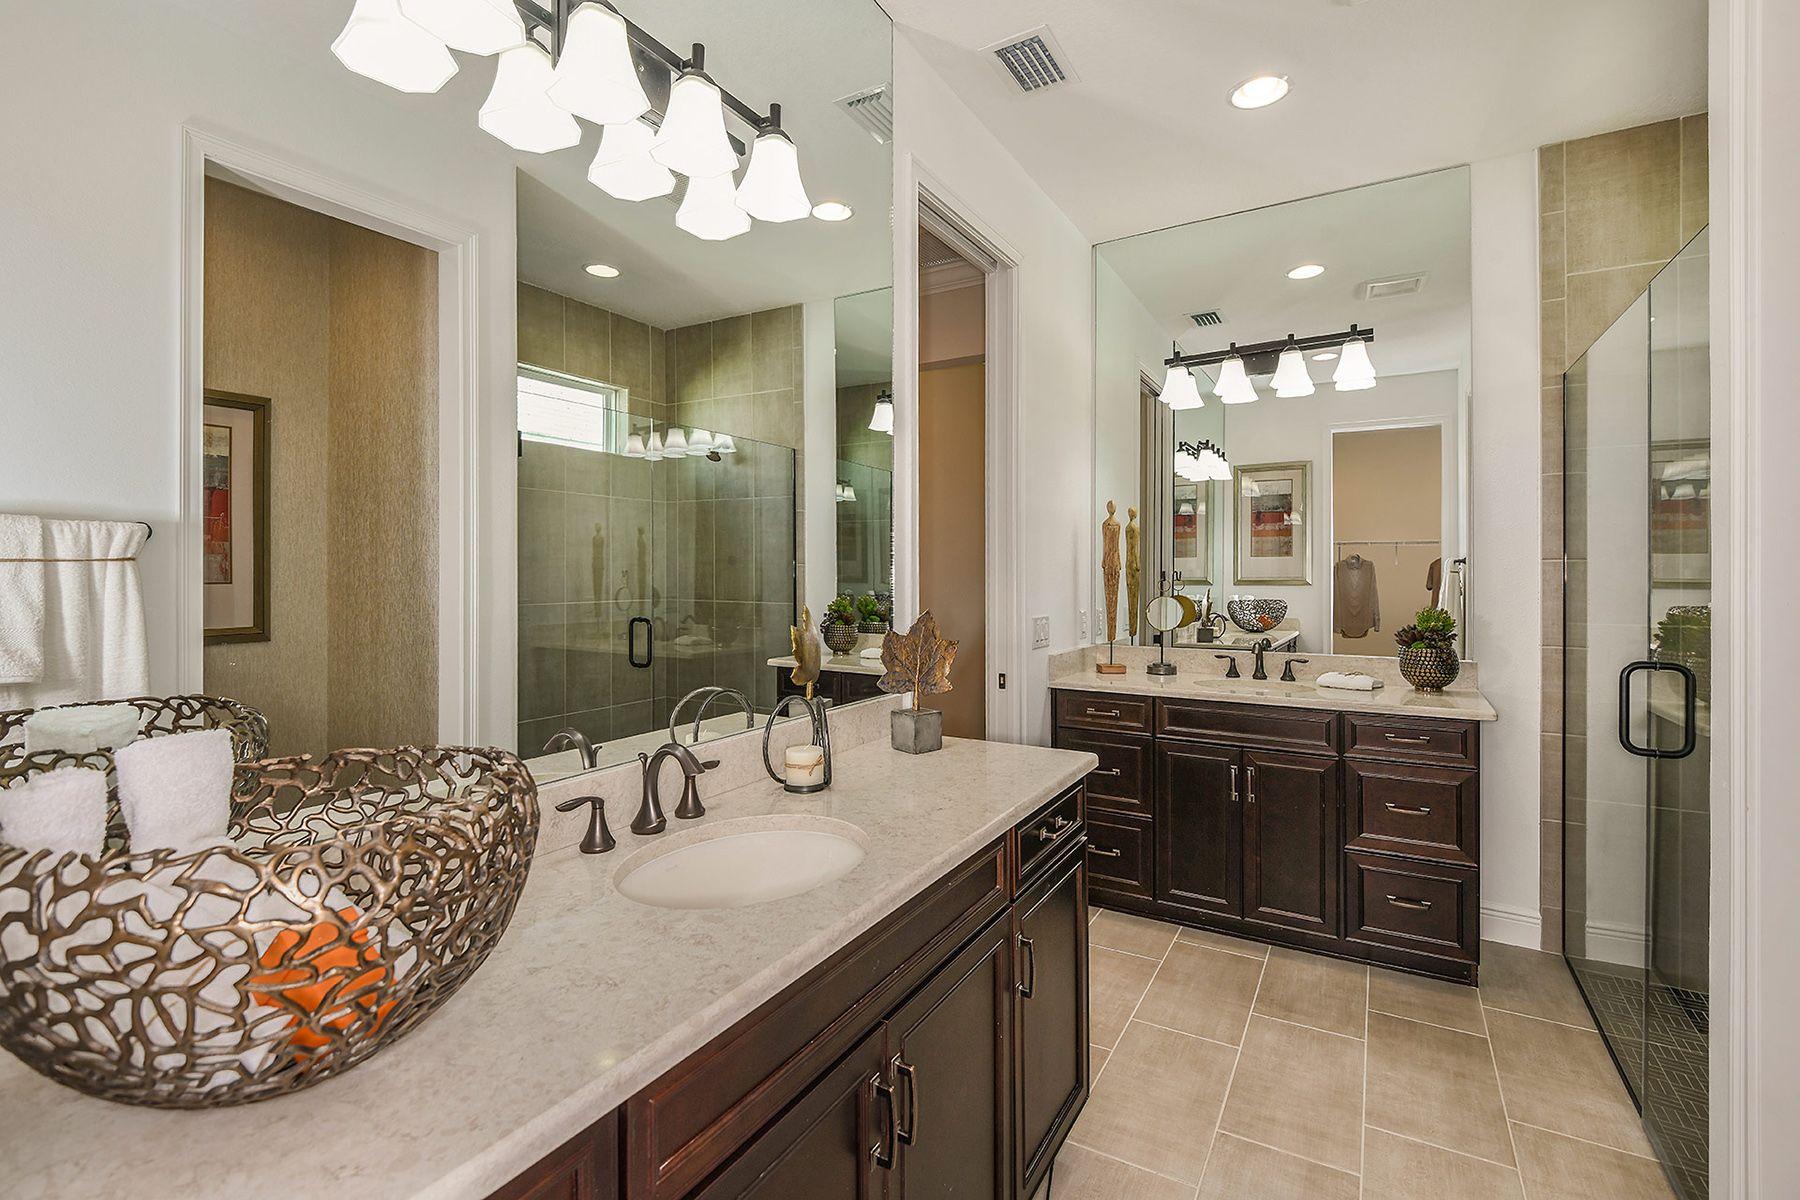 Bathroom featured in the Dawn By Mattamy Homes in Sarasota-Bradenton, FL